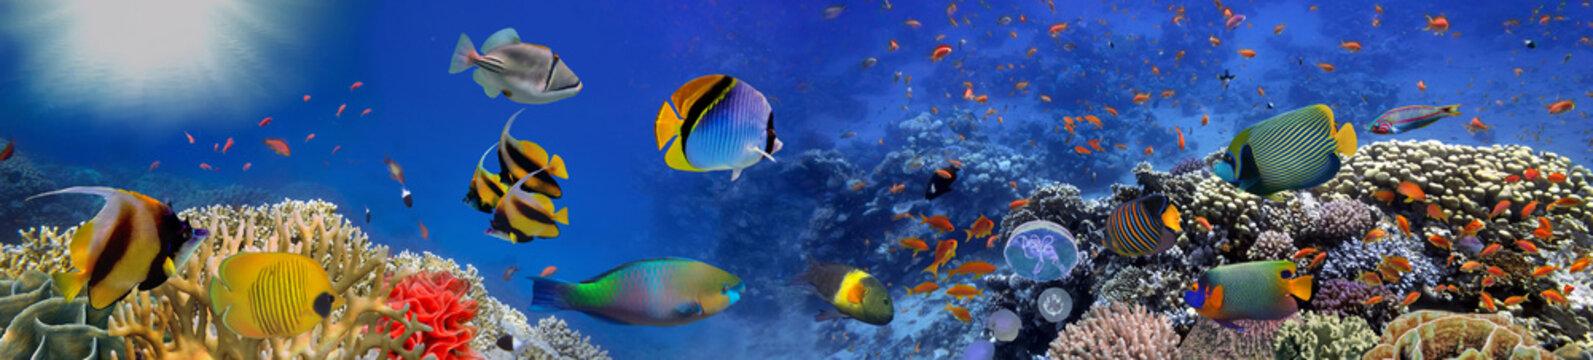 Sea corals. Panorama